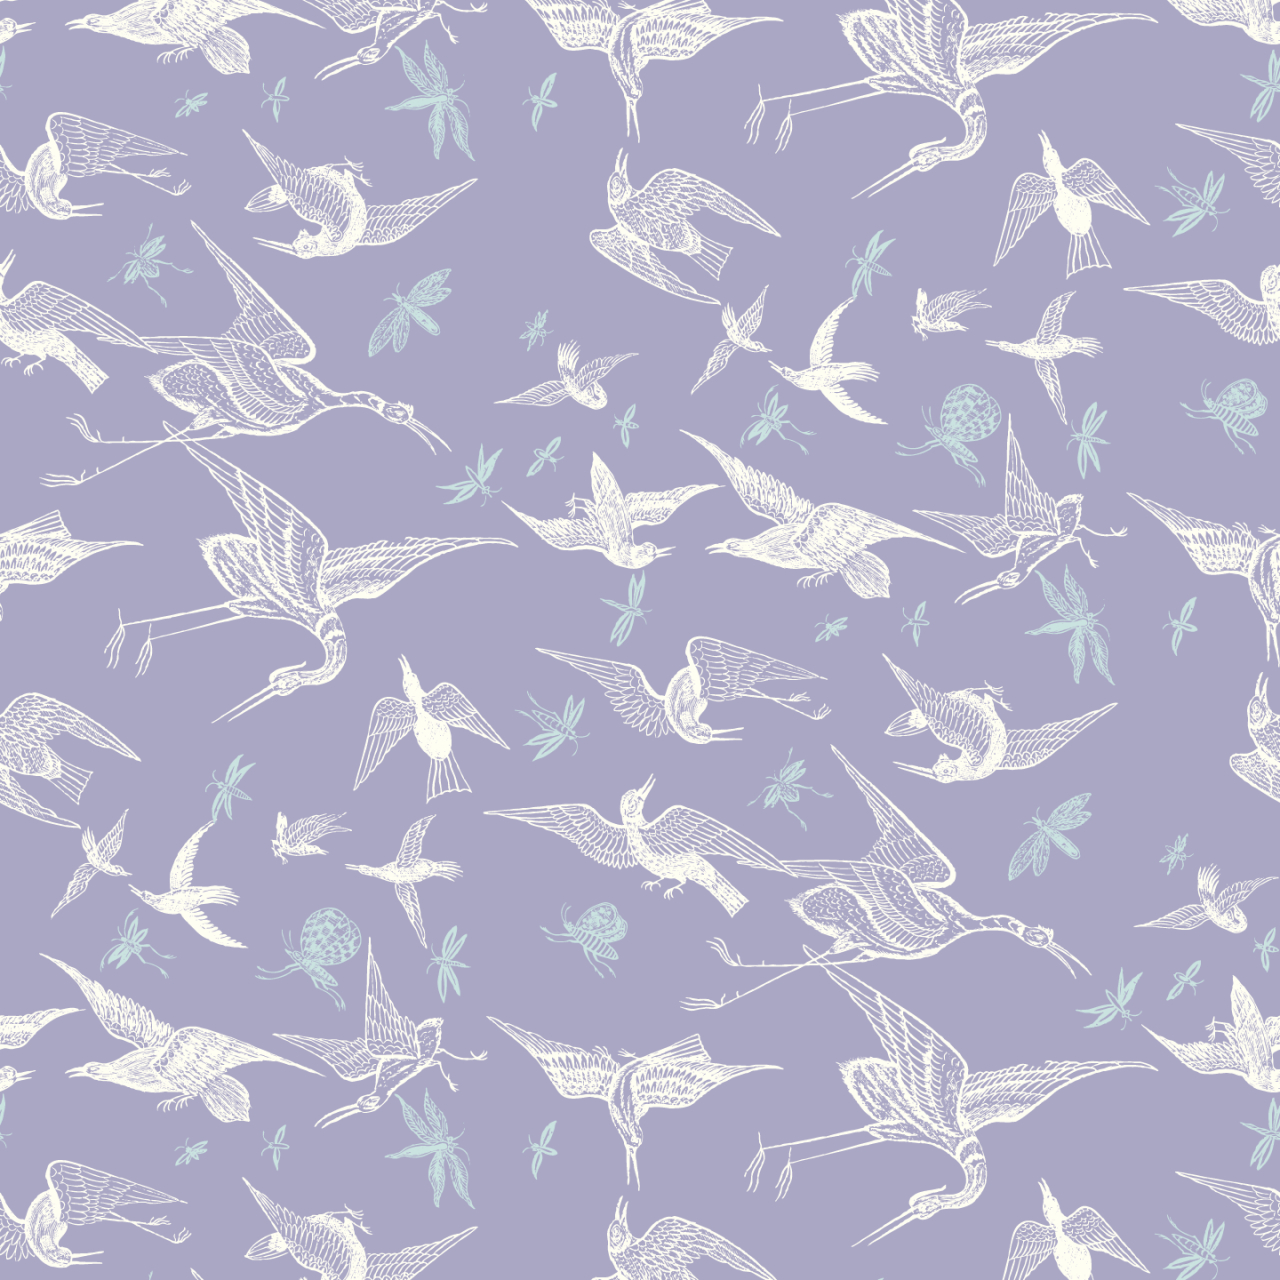 ChasingBirds_Lavender.jpg